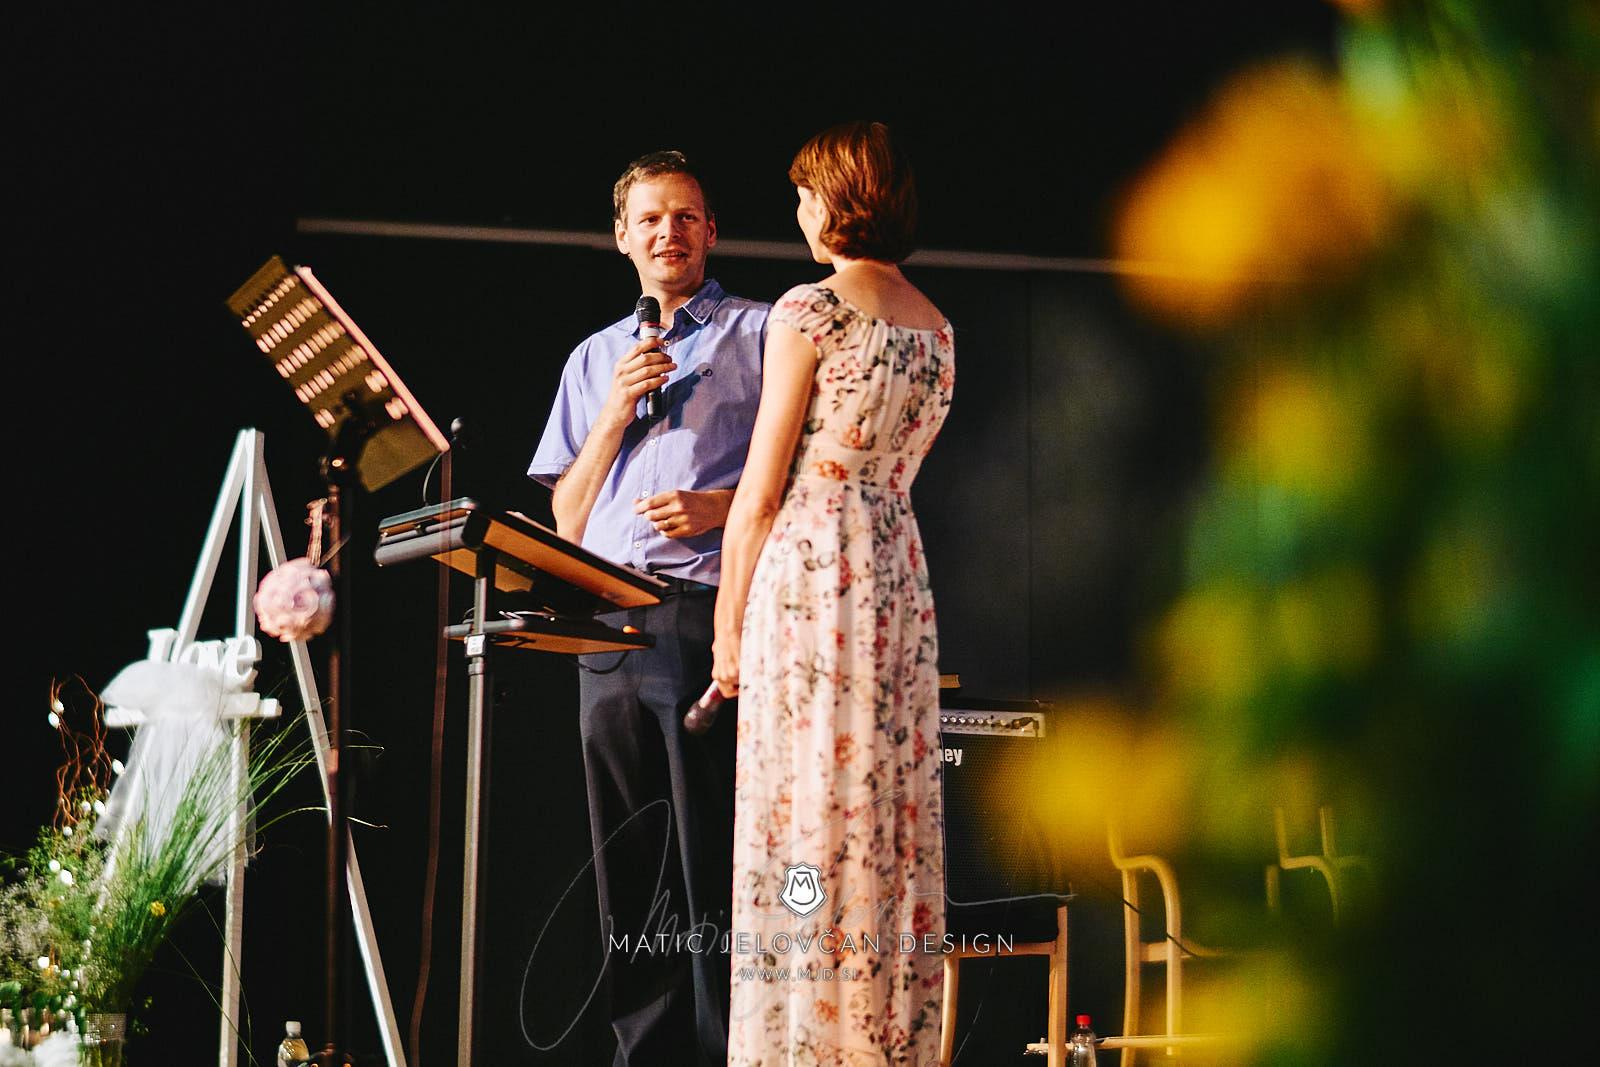 2017 07 02 17.00.35 DSC03482 Web - A Wedding Anniversary